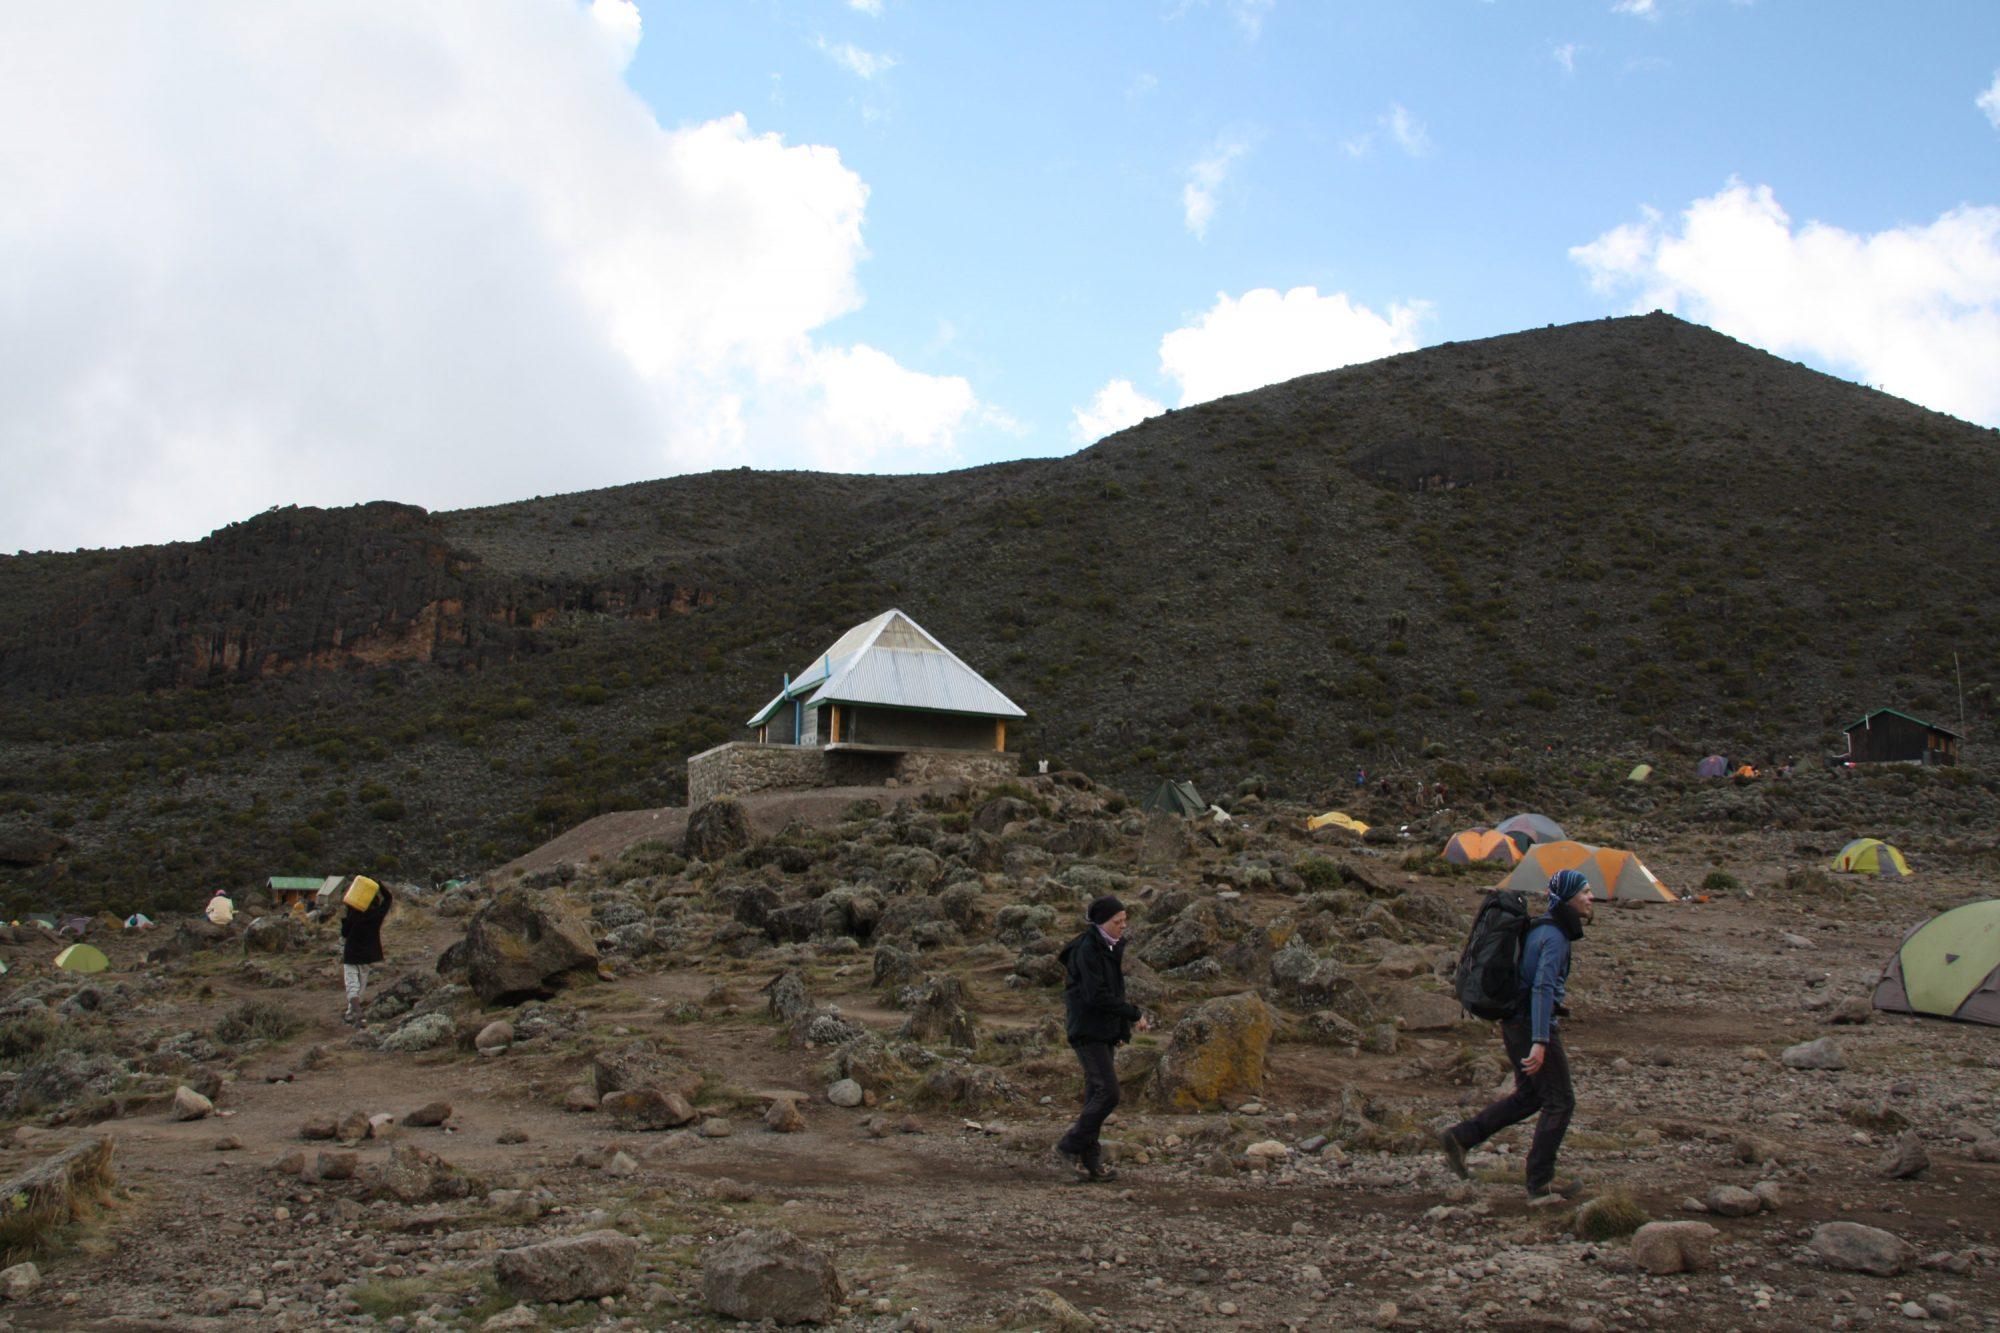 Barranco Camp, Toilettenhaus, Kilimandscharo, Kilimandscharo besteigen, Tansania, Afrika, Kilimandscharo Tour, Erfahrungsbericht, Machame Route